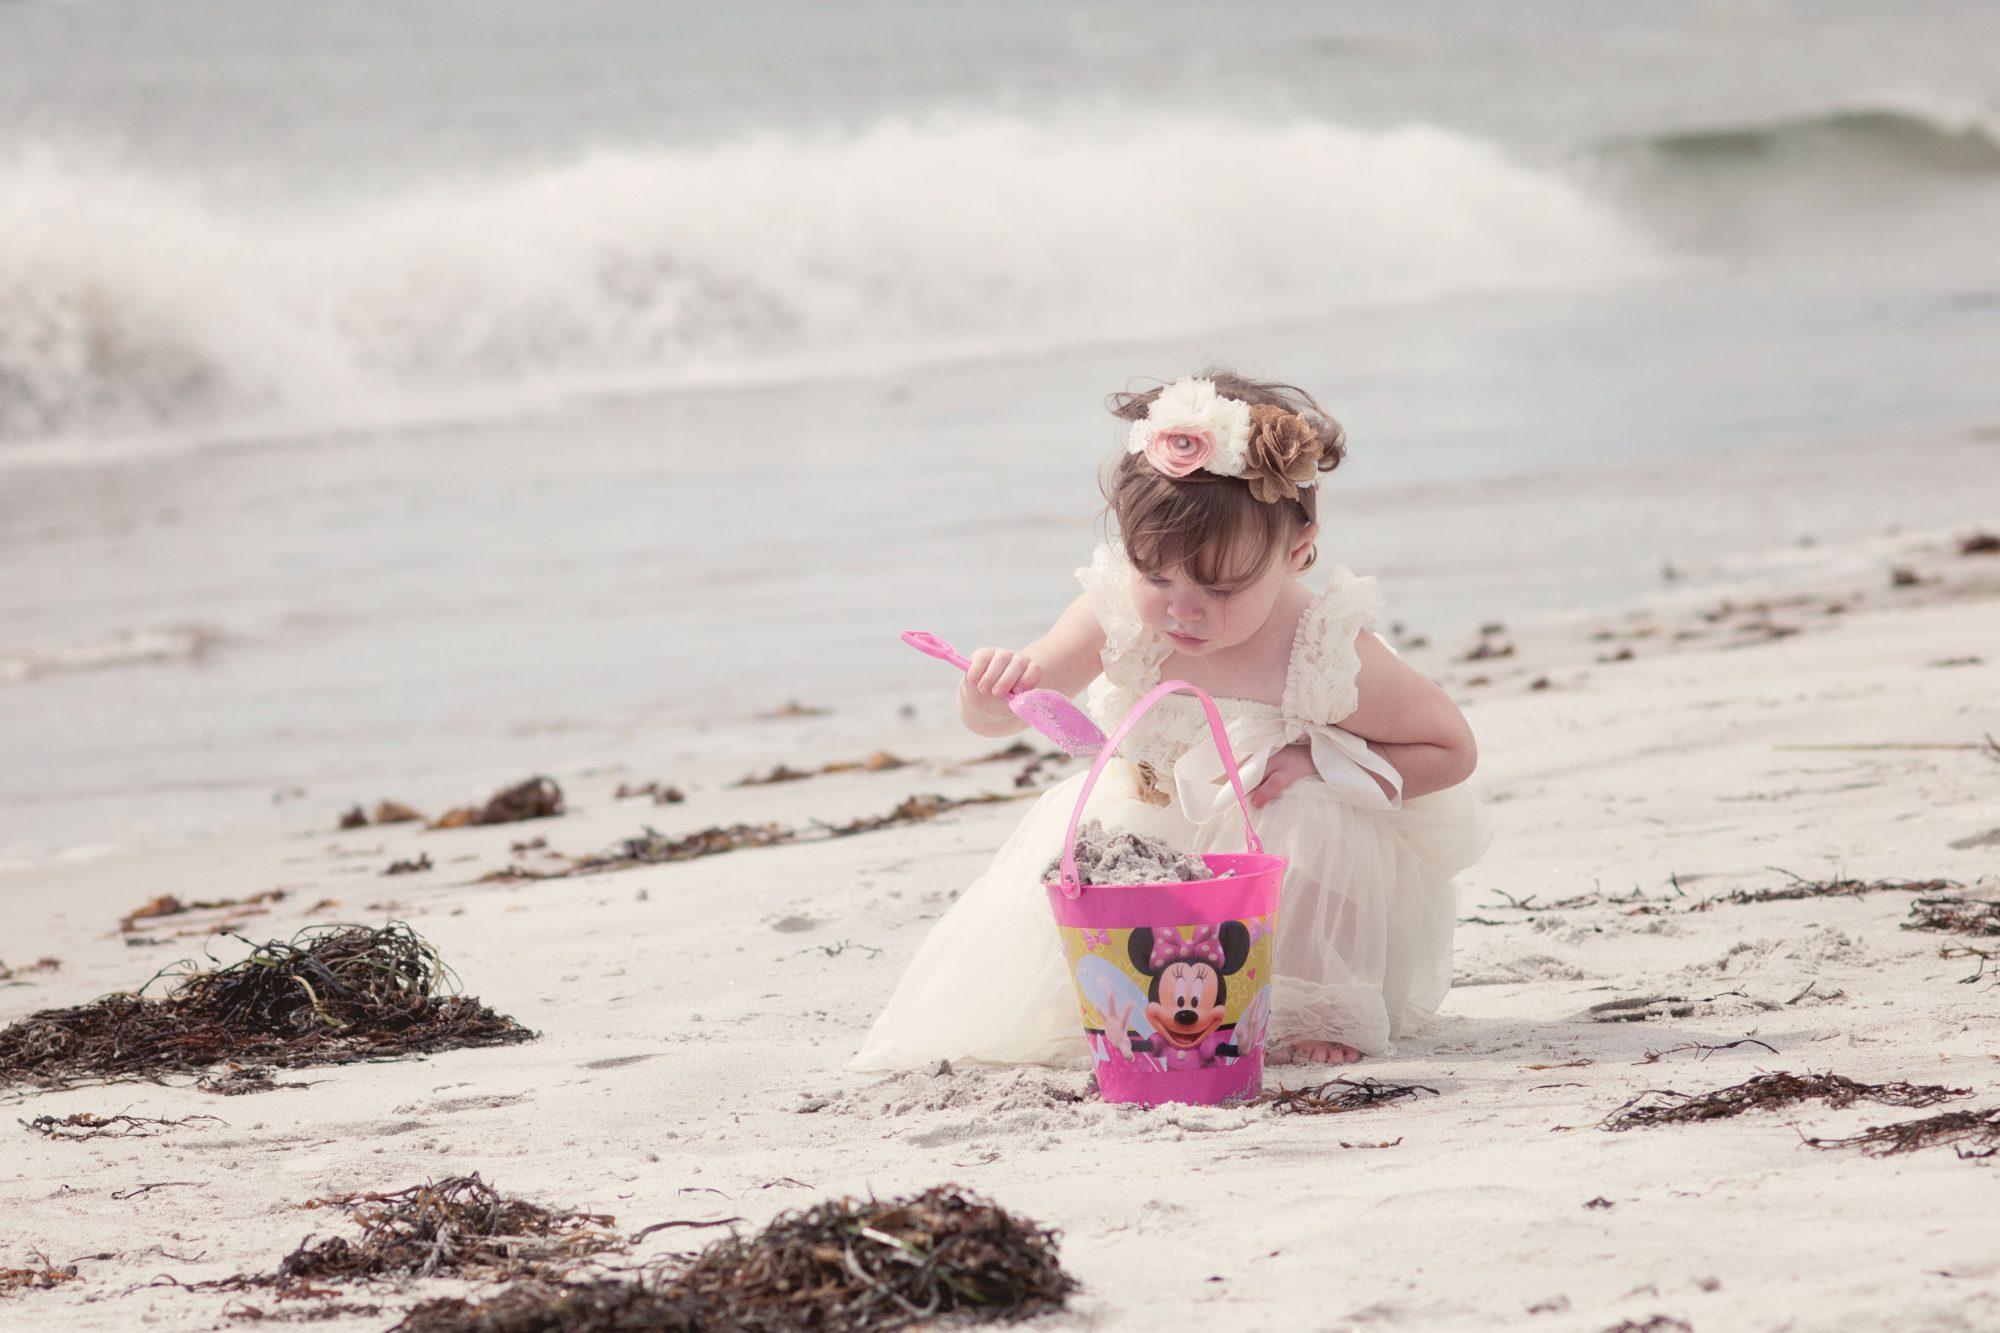 Pemaquid Beach Princess at the shore